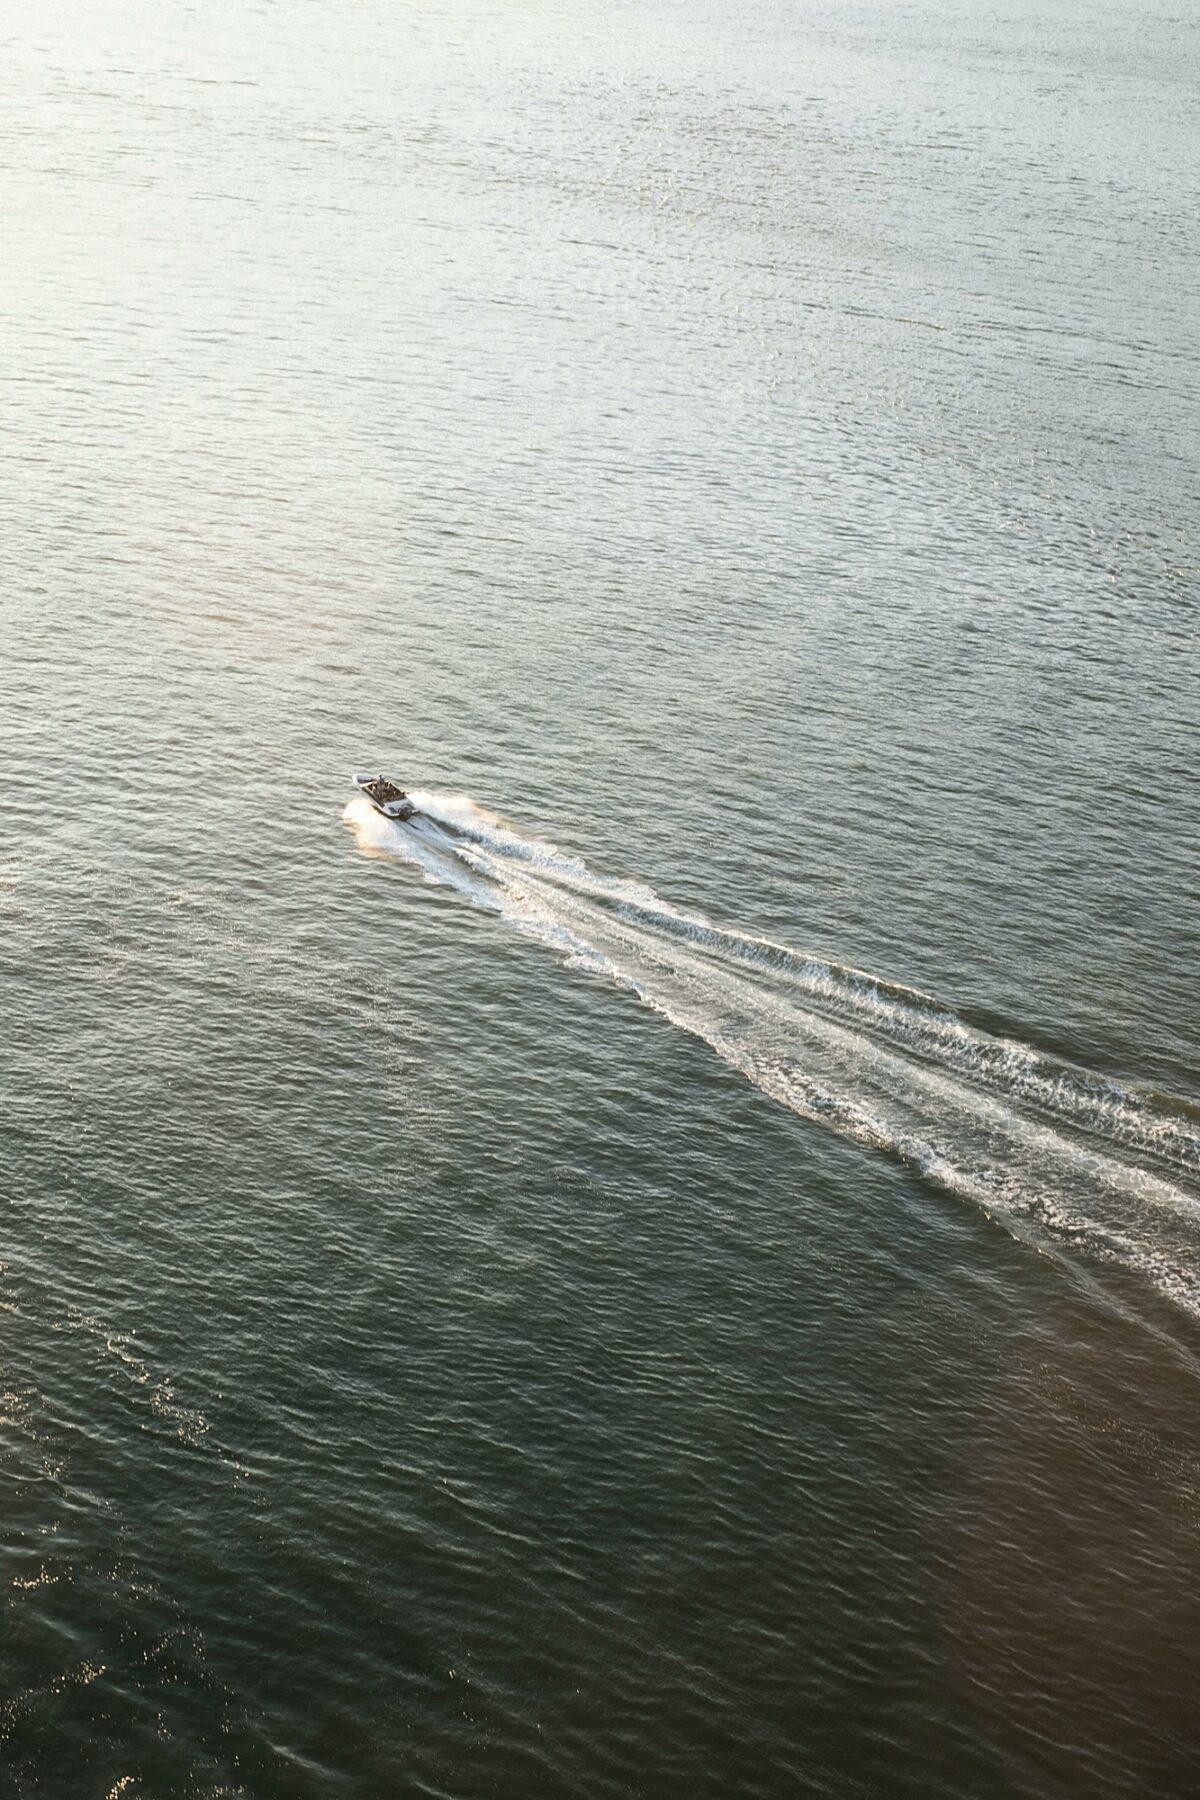 Boat kyle thacker 2 M0bm TZ La No unsplash